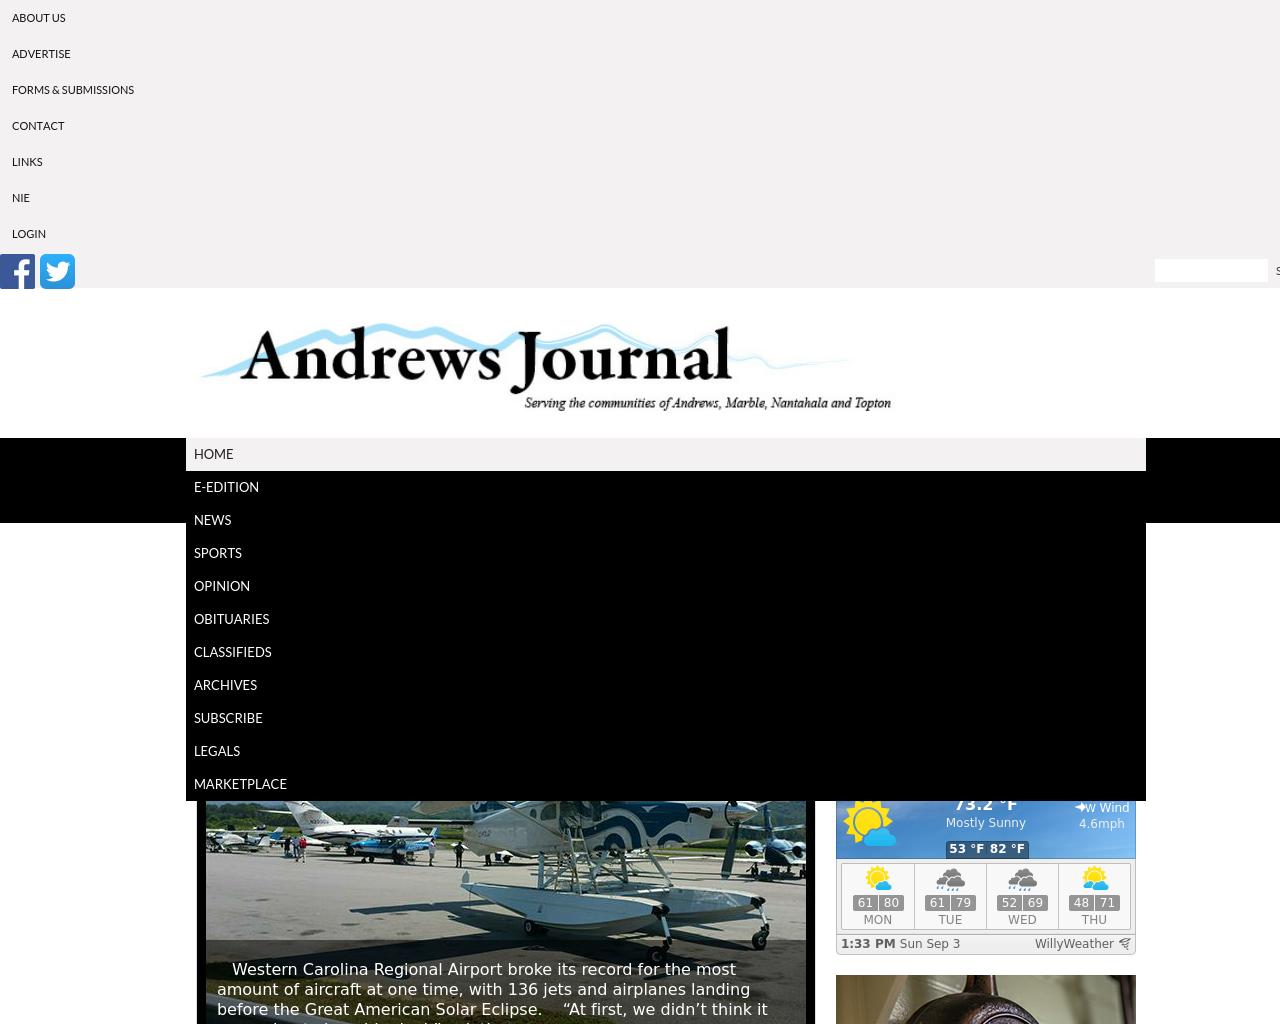 Andrews-Journal-Advertising-Reviews-Pricing